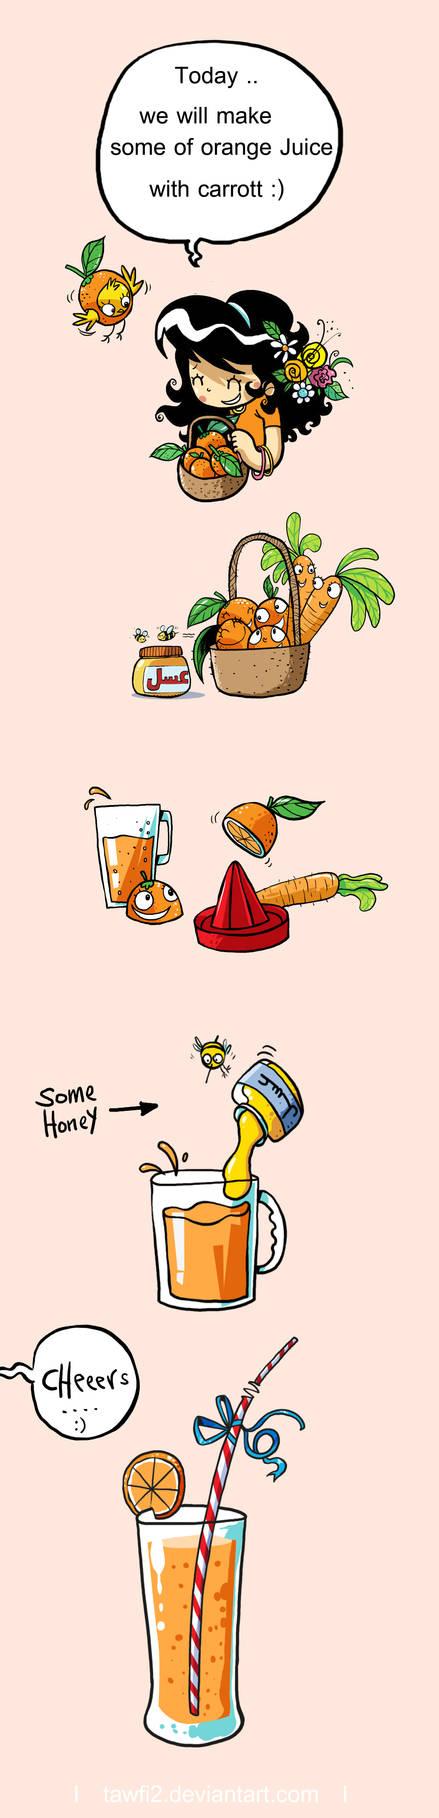 How Make Some Of orange Juice